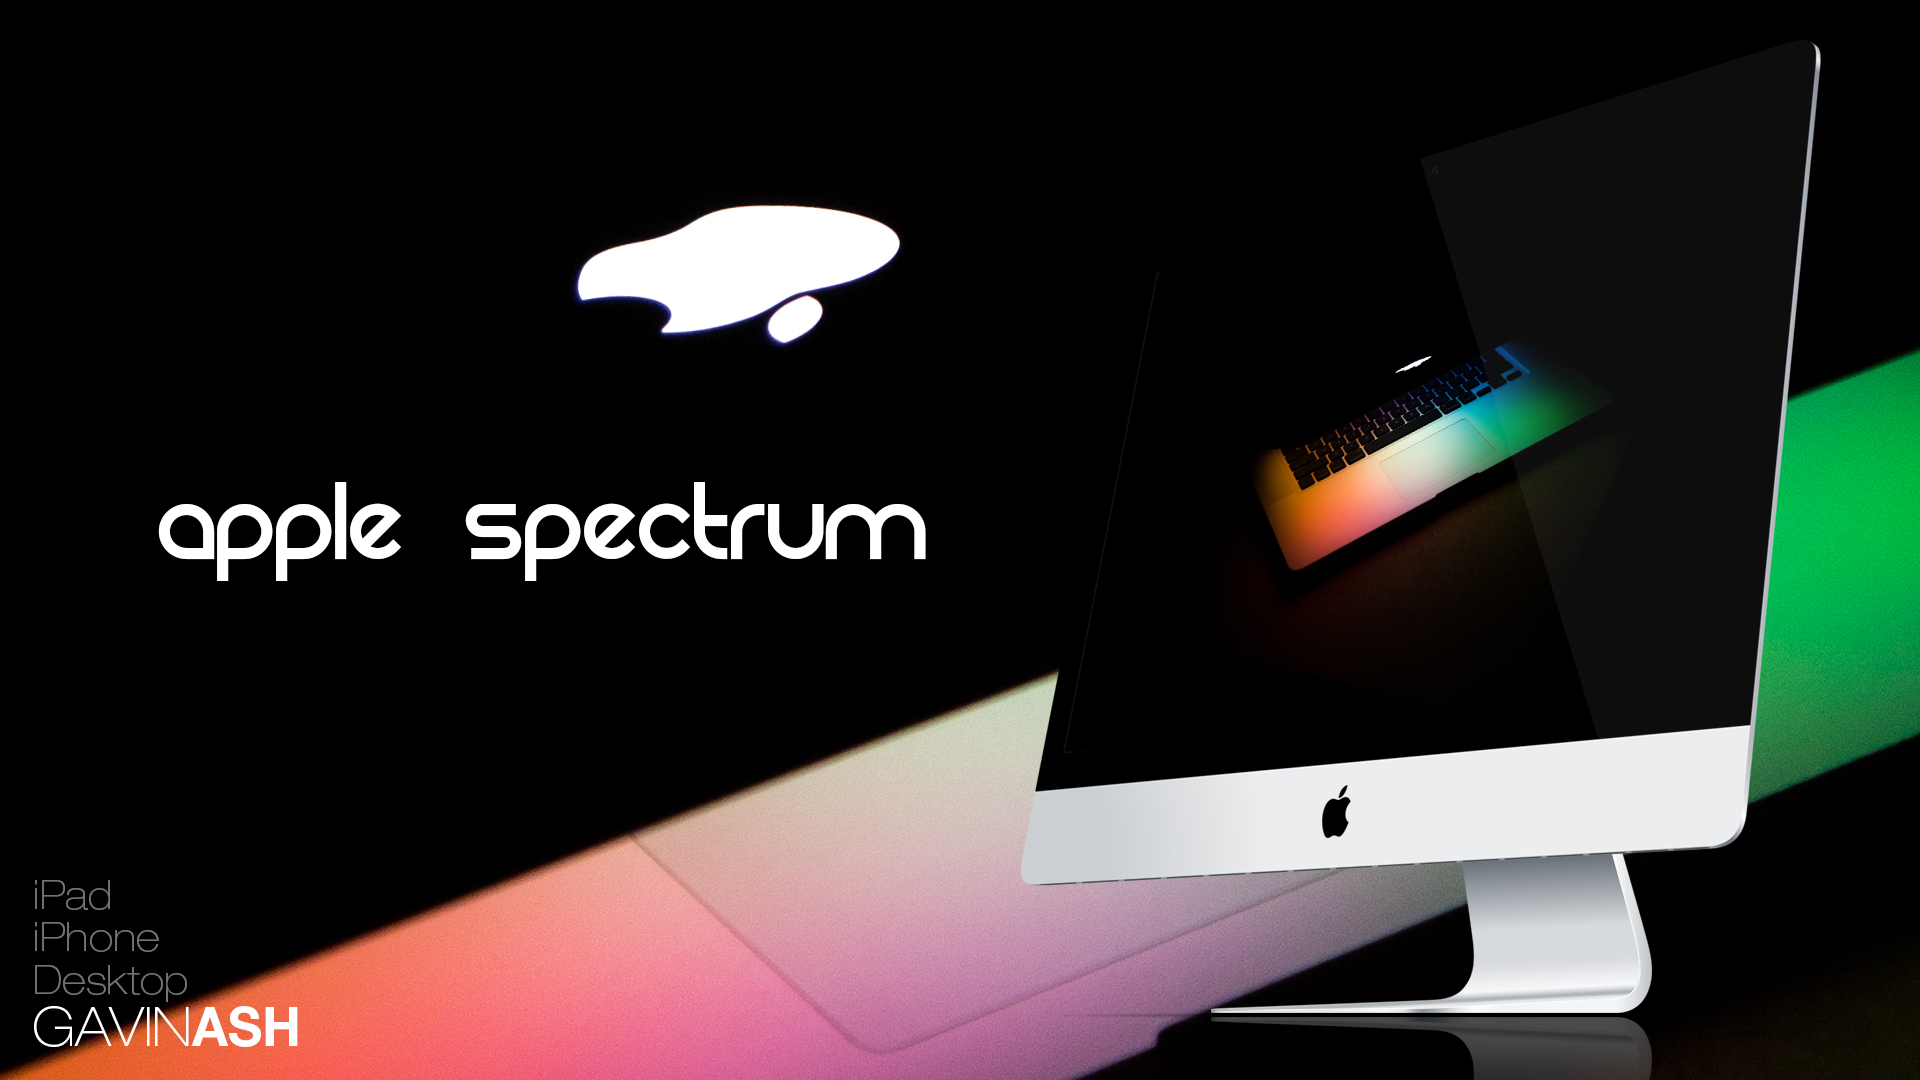 Apple Spectrum - Wallpaper by GavinAsh